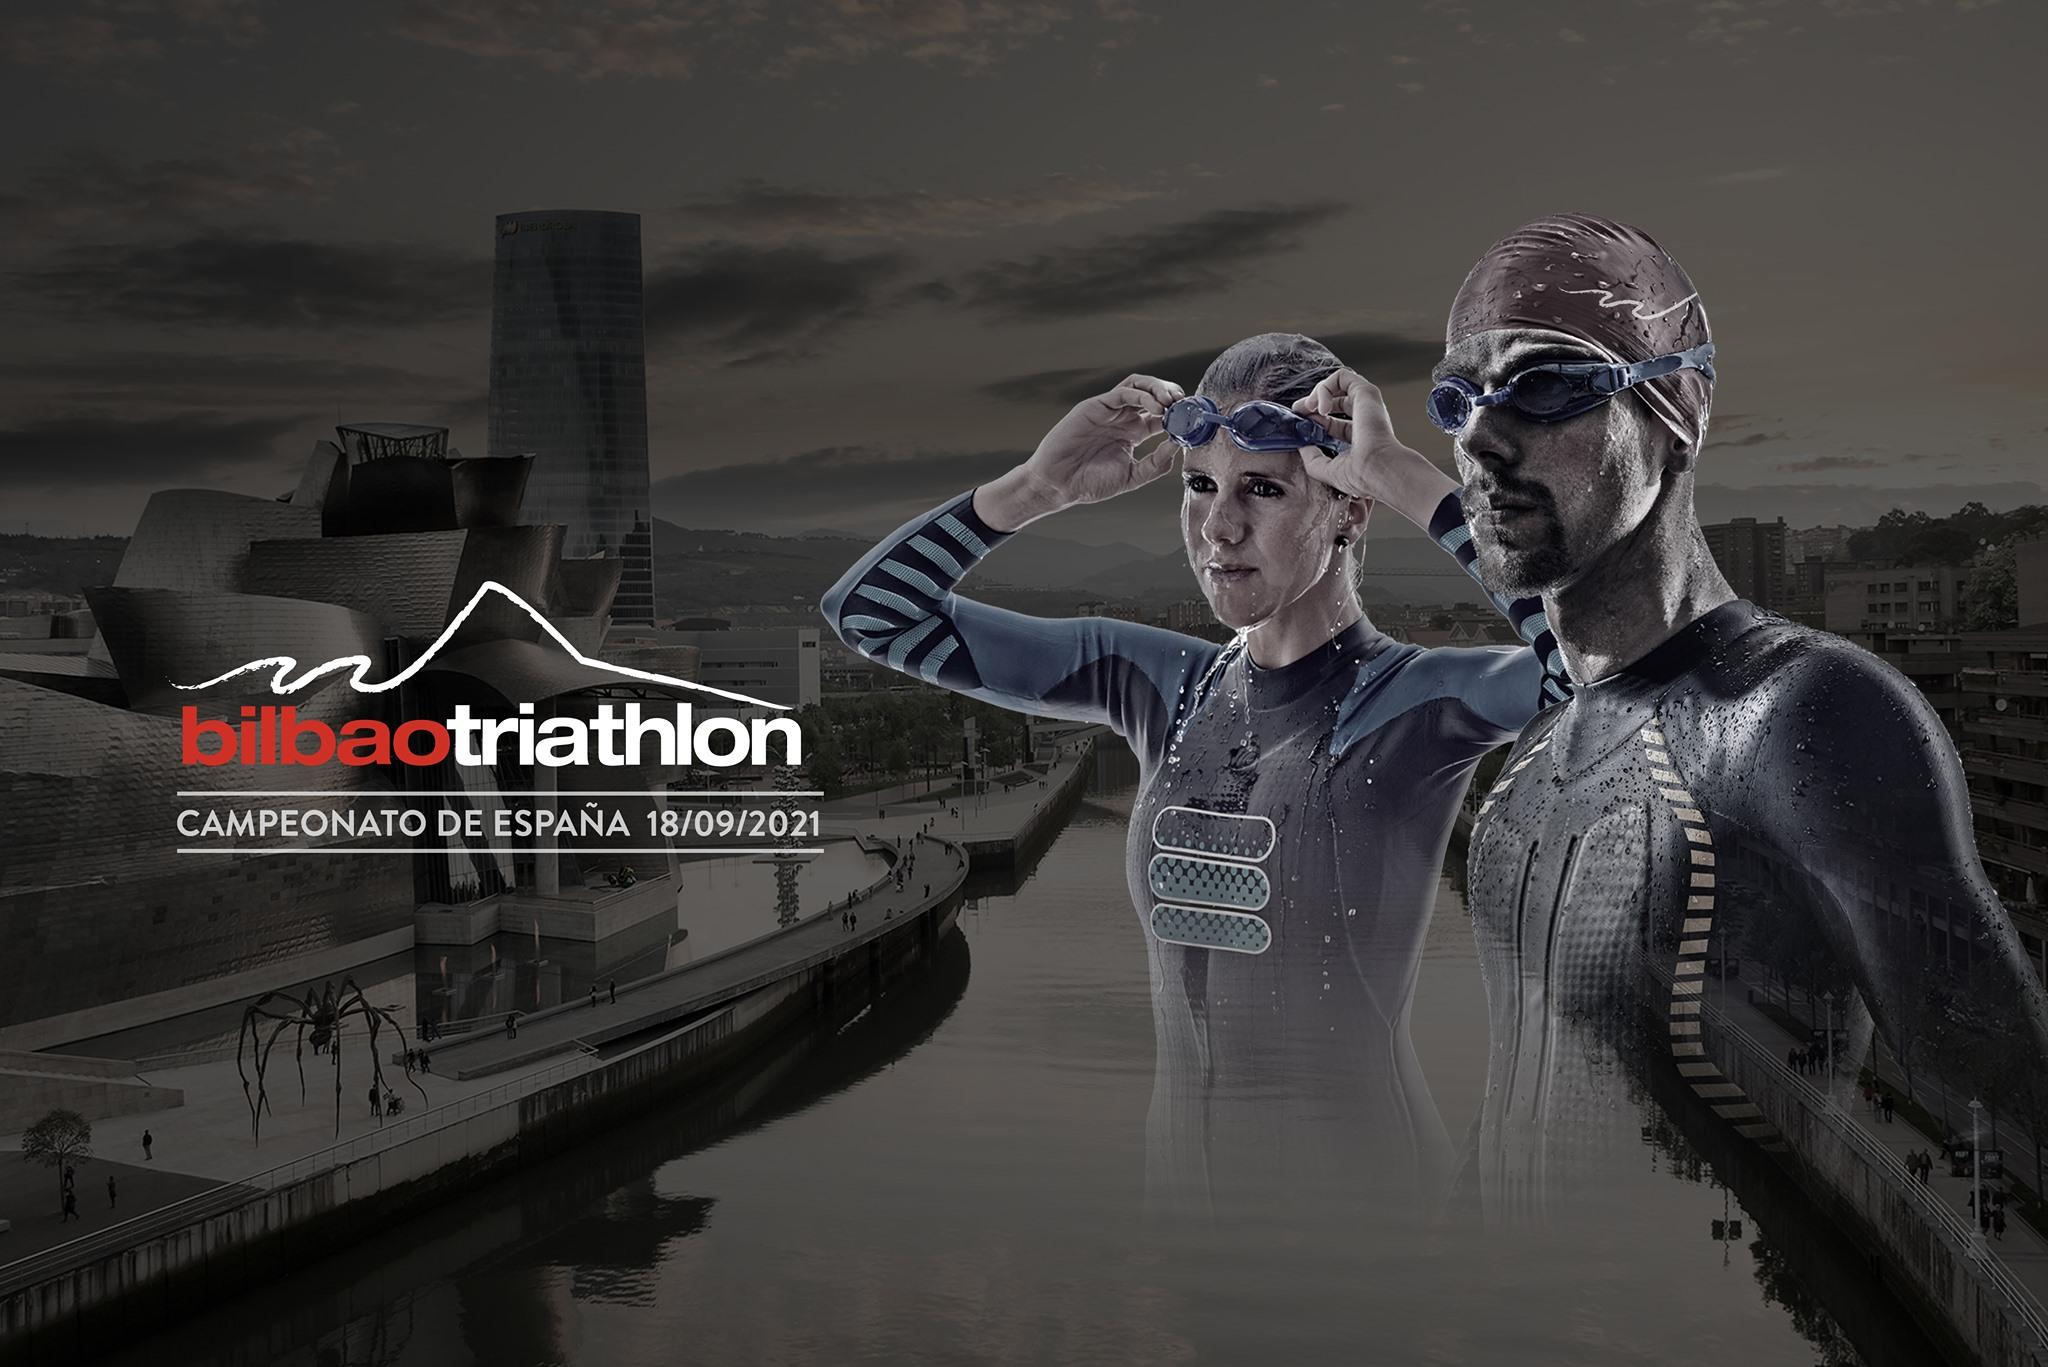 bilbao triathlon 2021